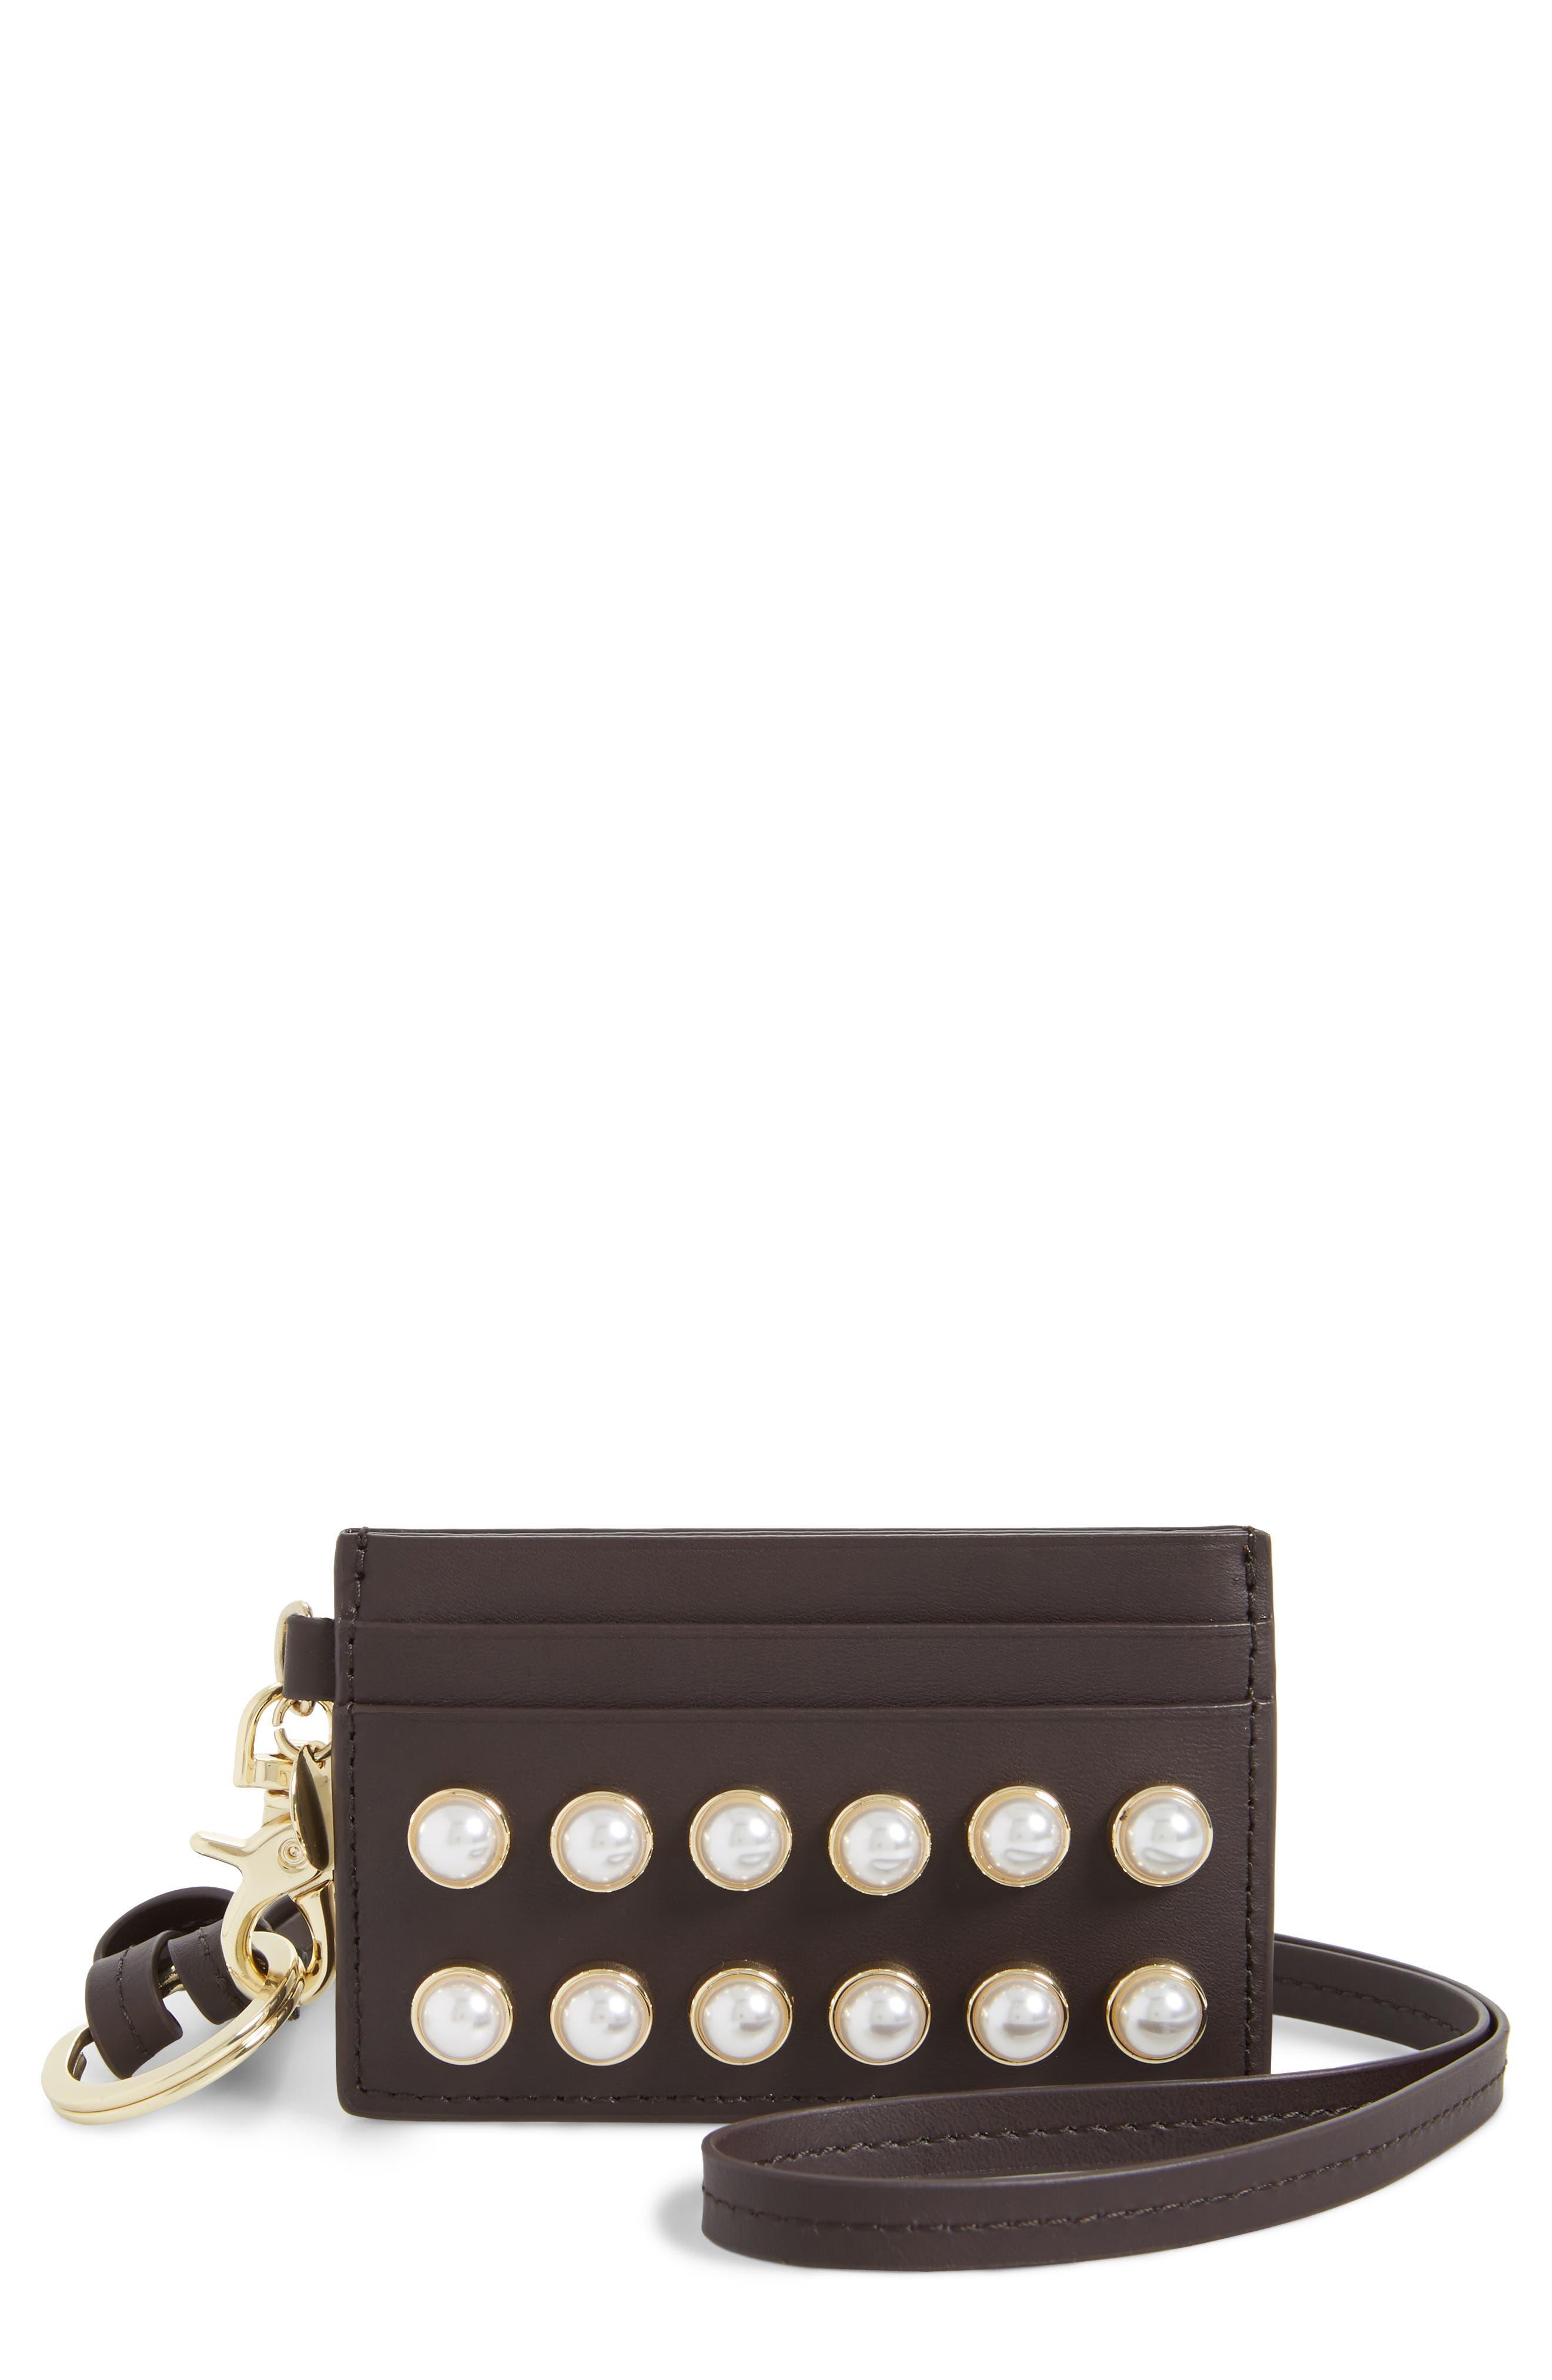 Imitation Pearl Lady Earthette Leather Lanyard,                         Main,                         color, 500